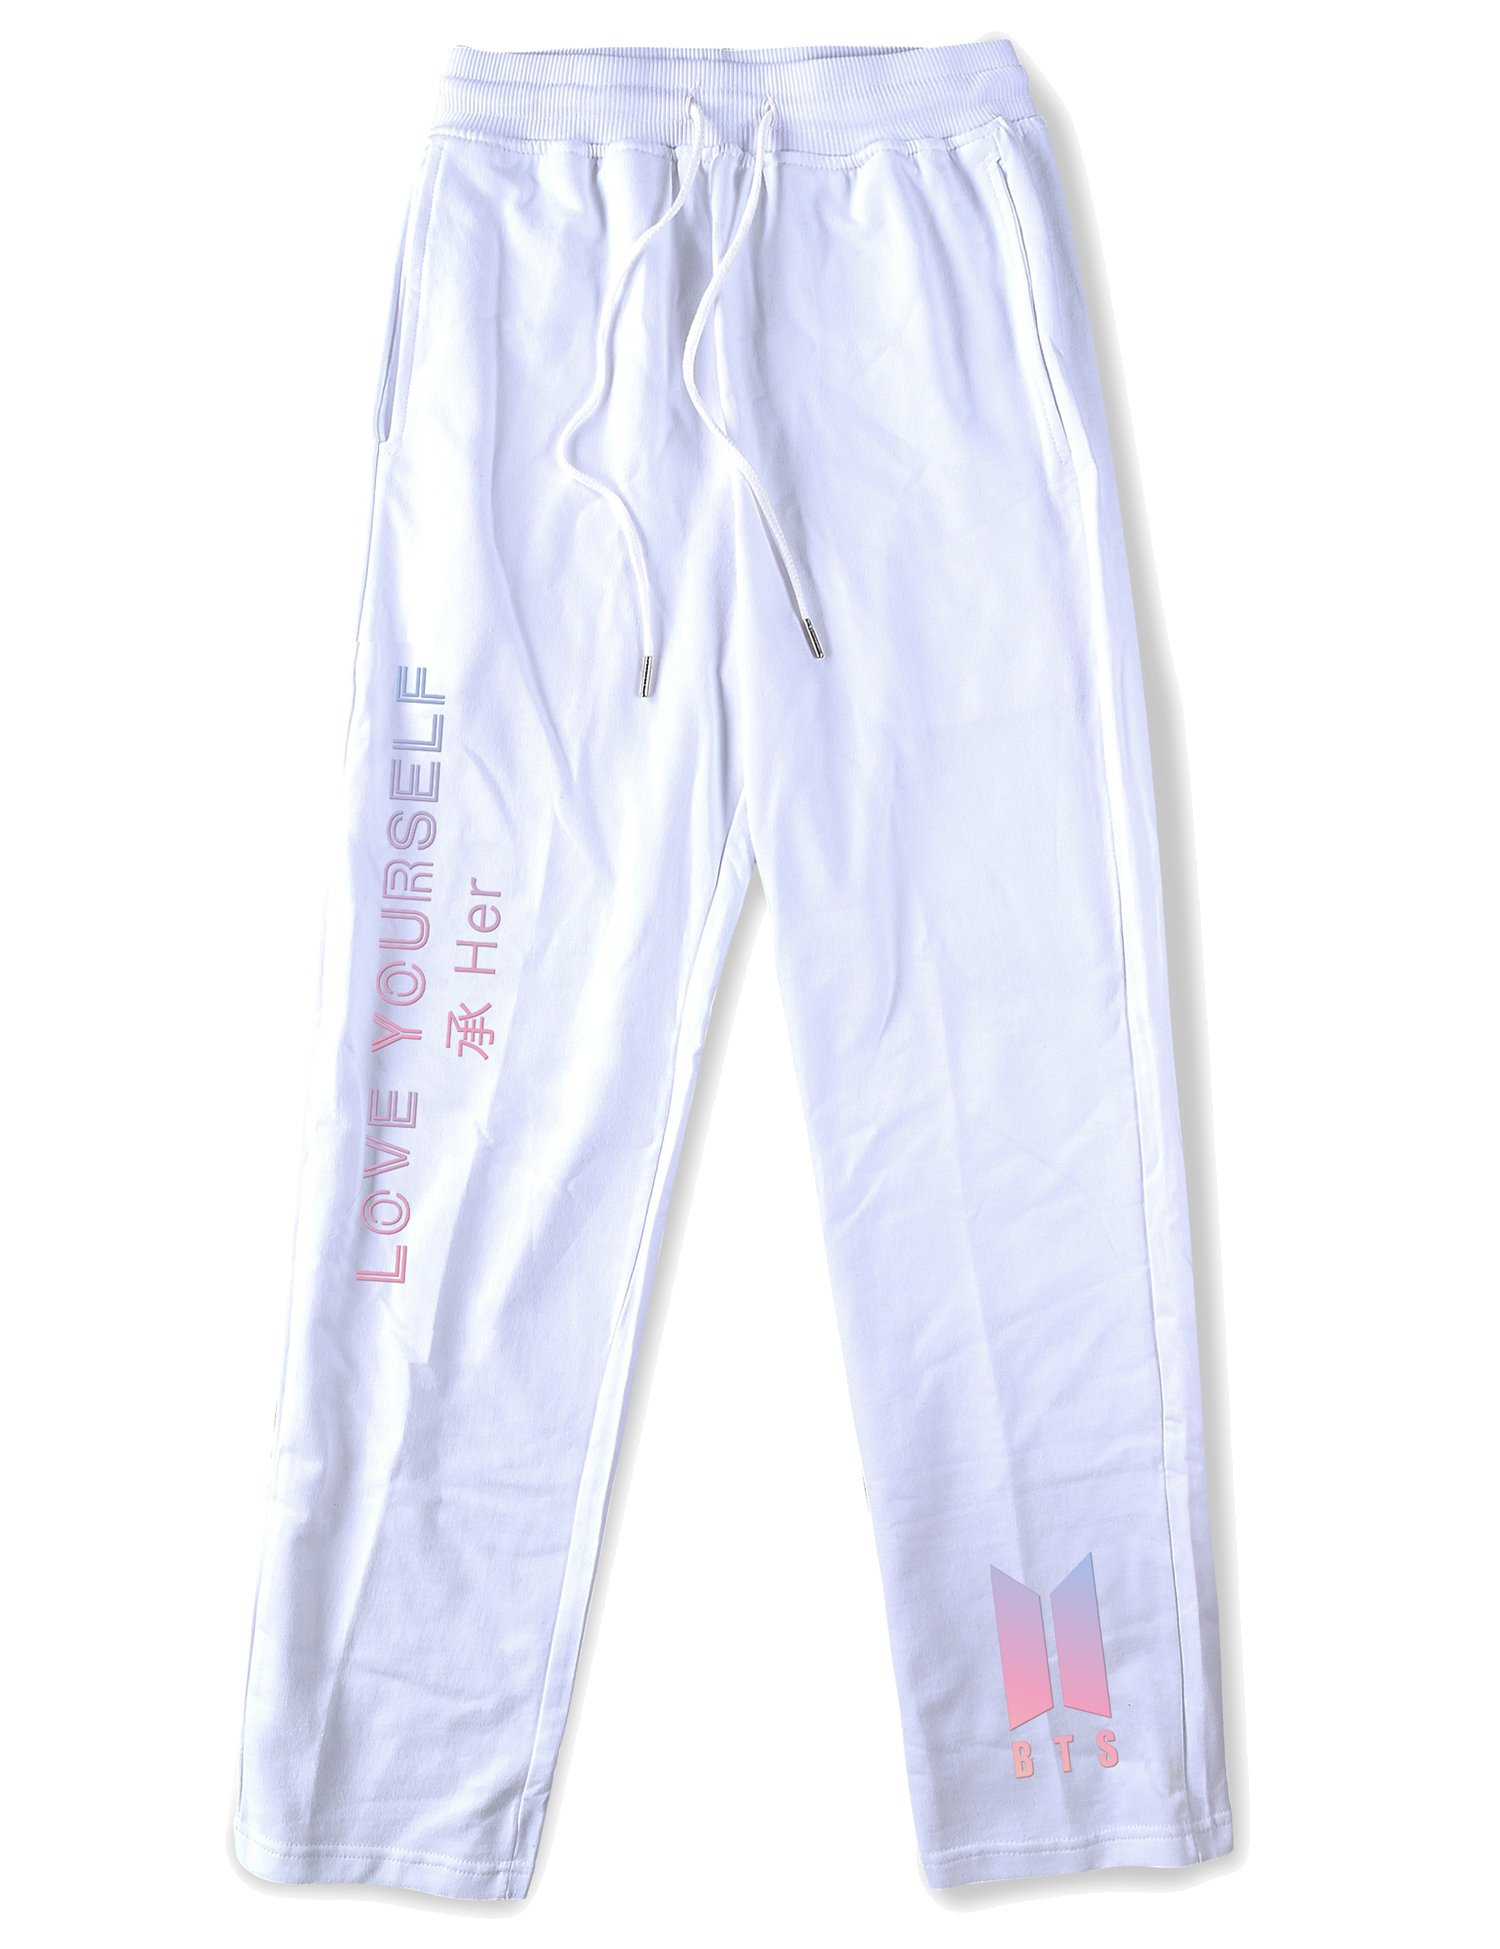 BTS Sweatpants Bangtan Boys Love Yourself Same Pants Jung Kook Suga White L